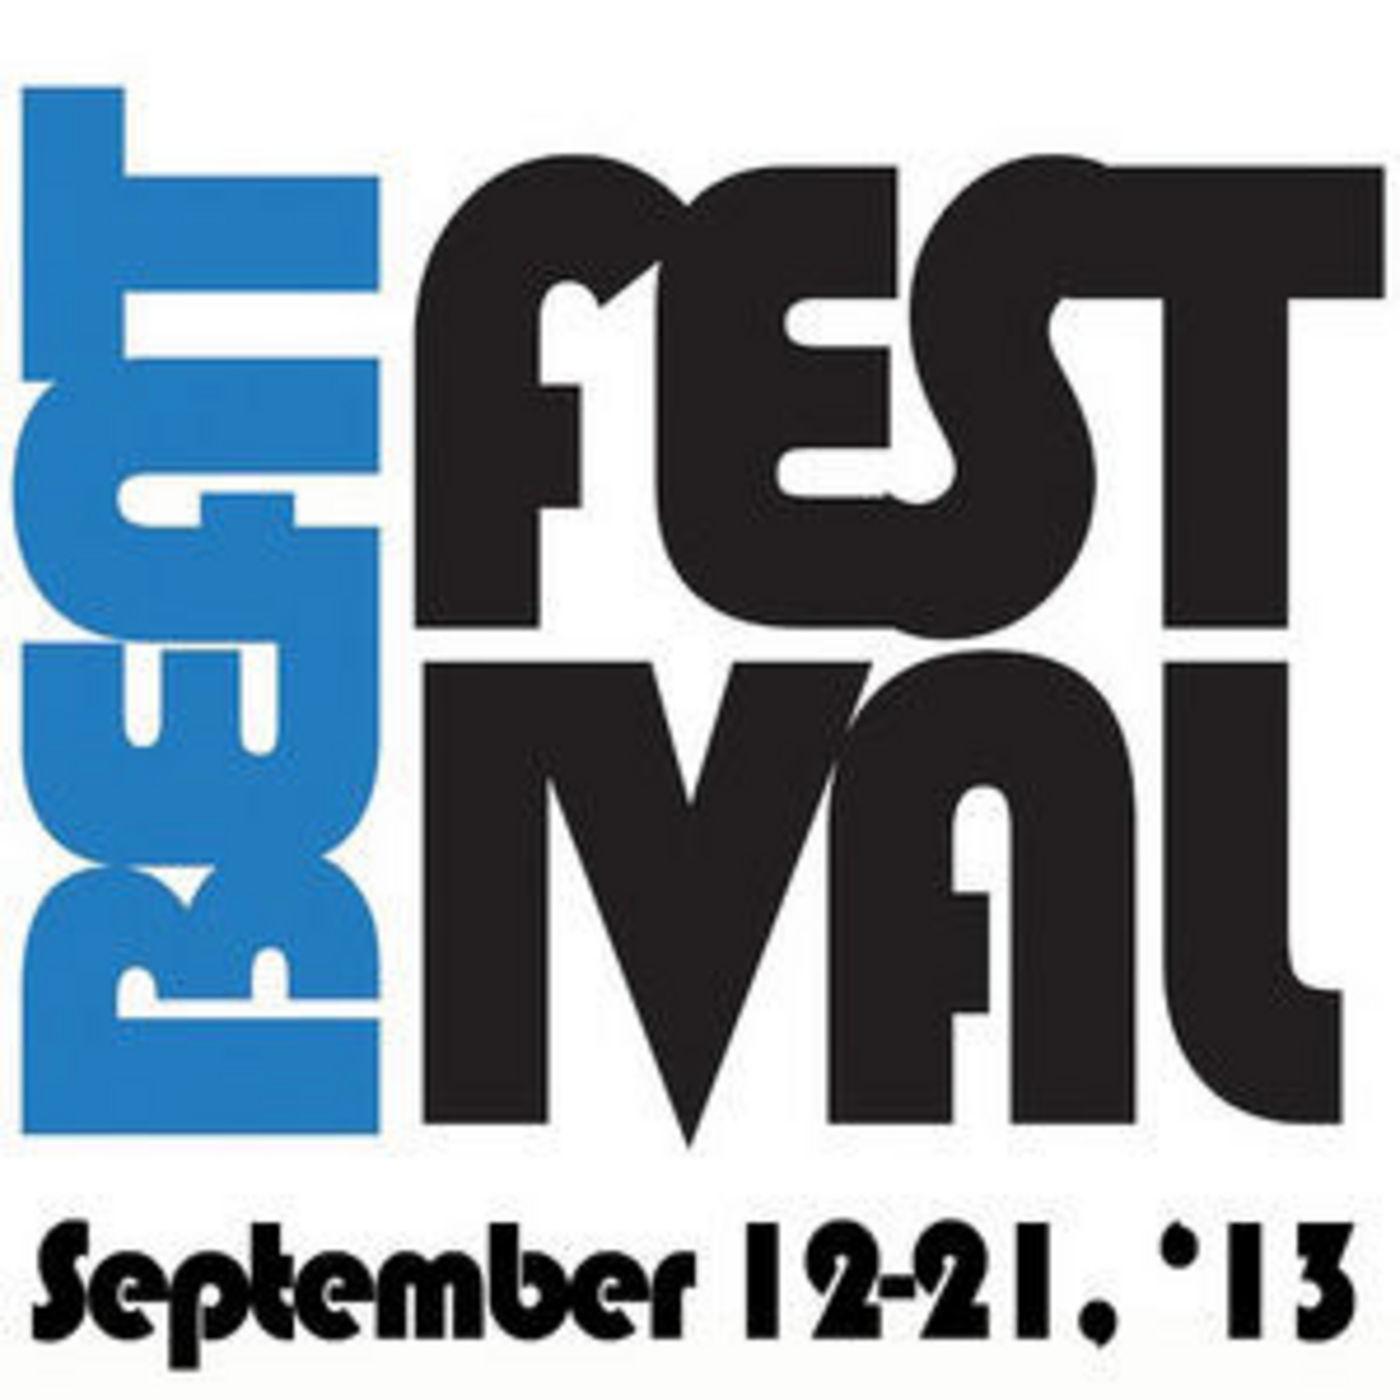 <![CDATA[BEAT Festival Podcast]]>